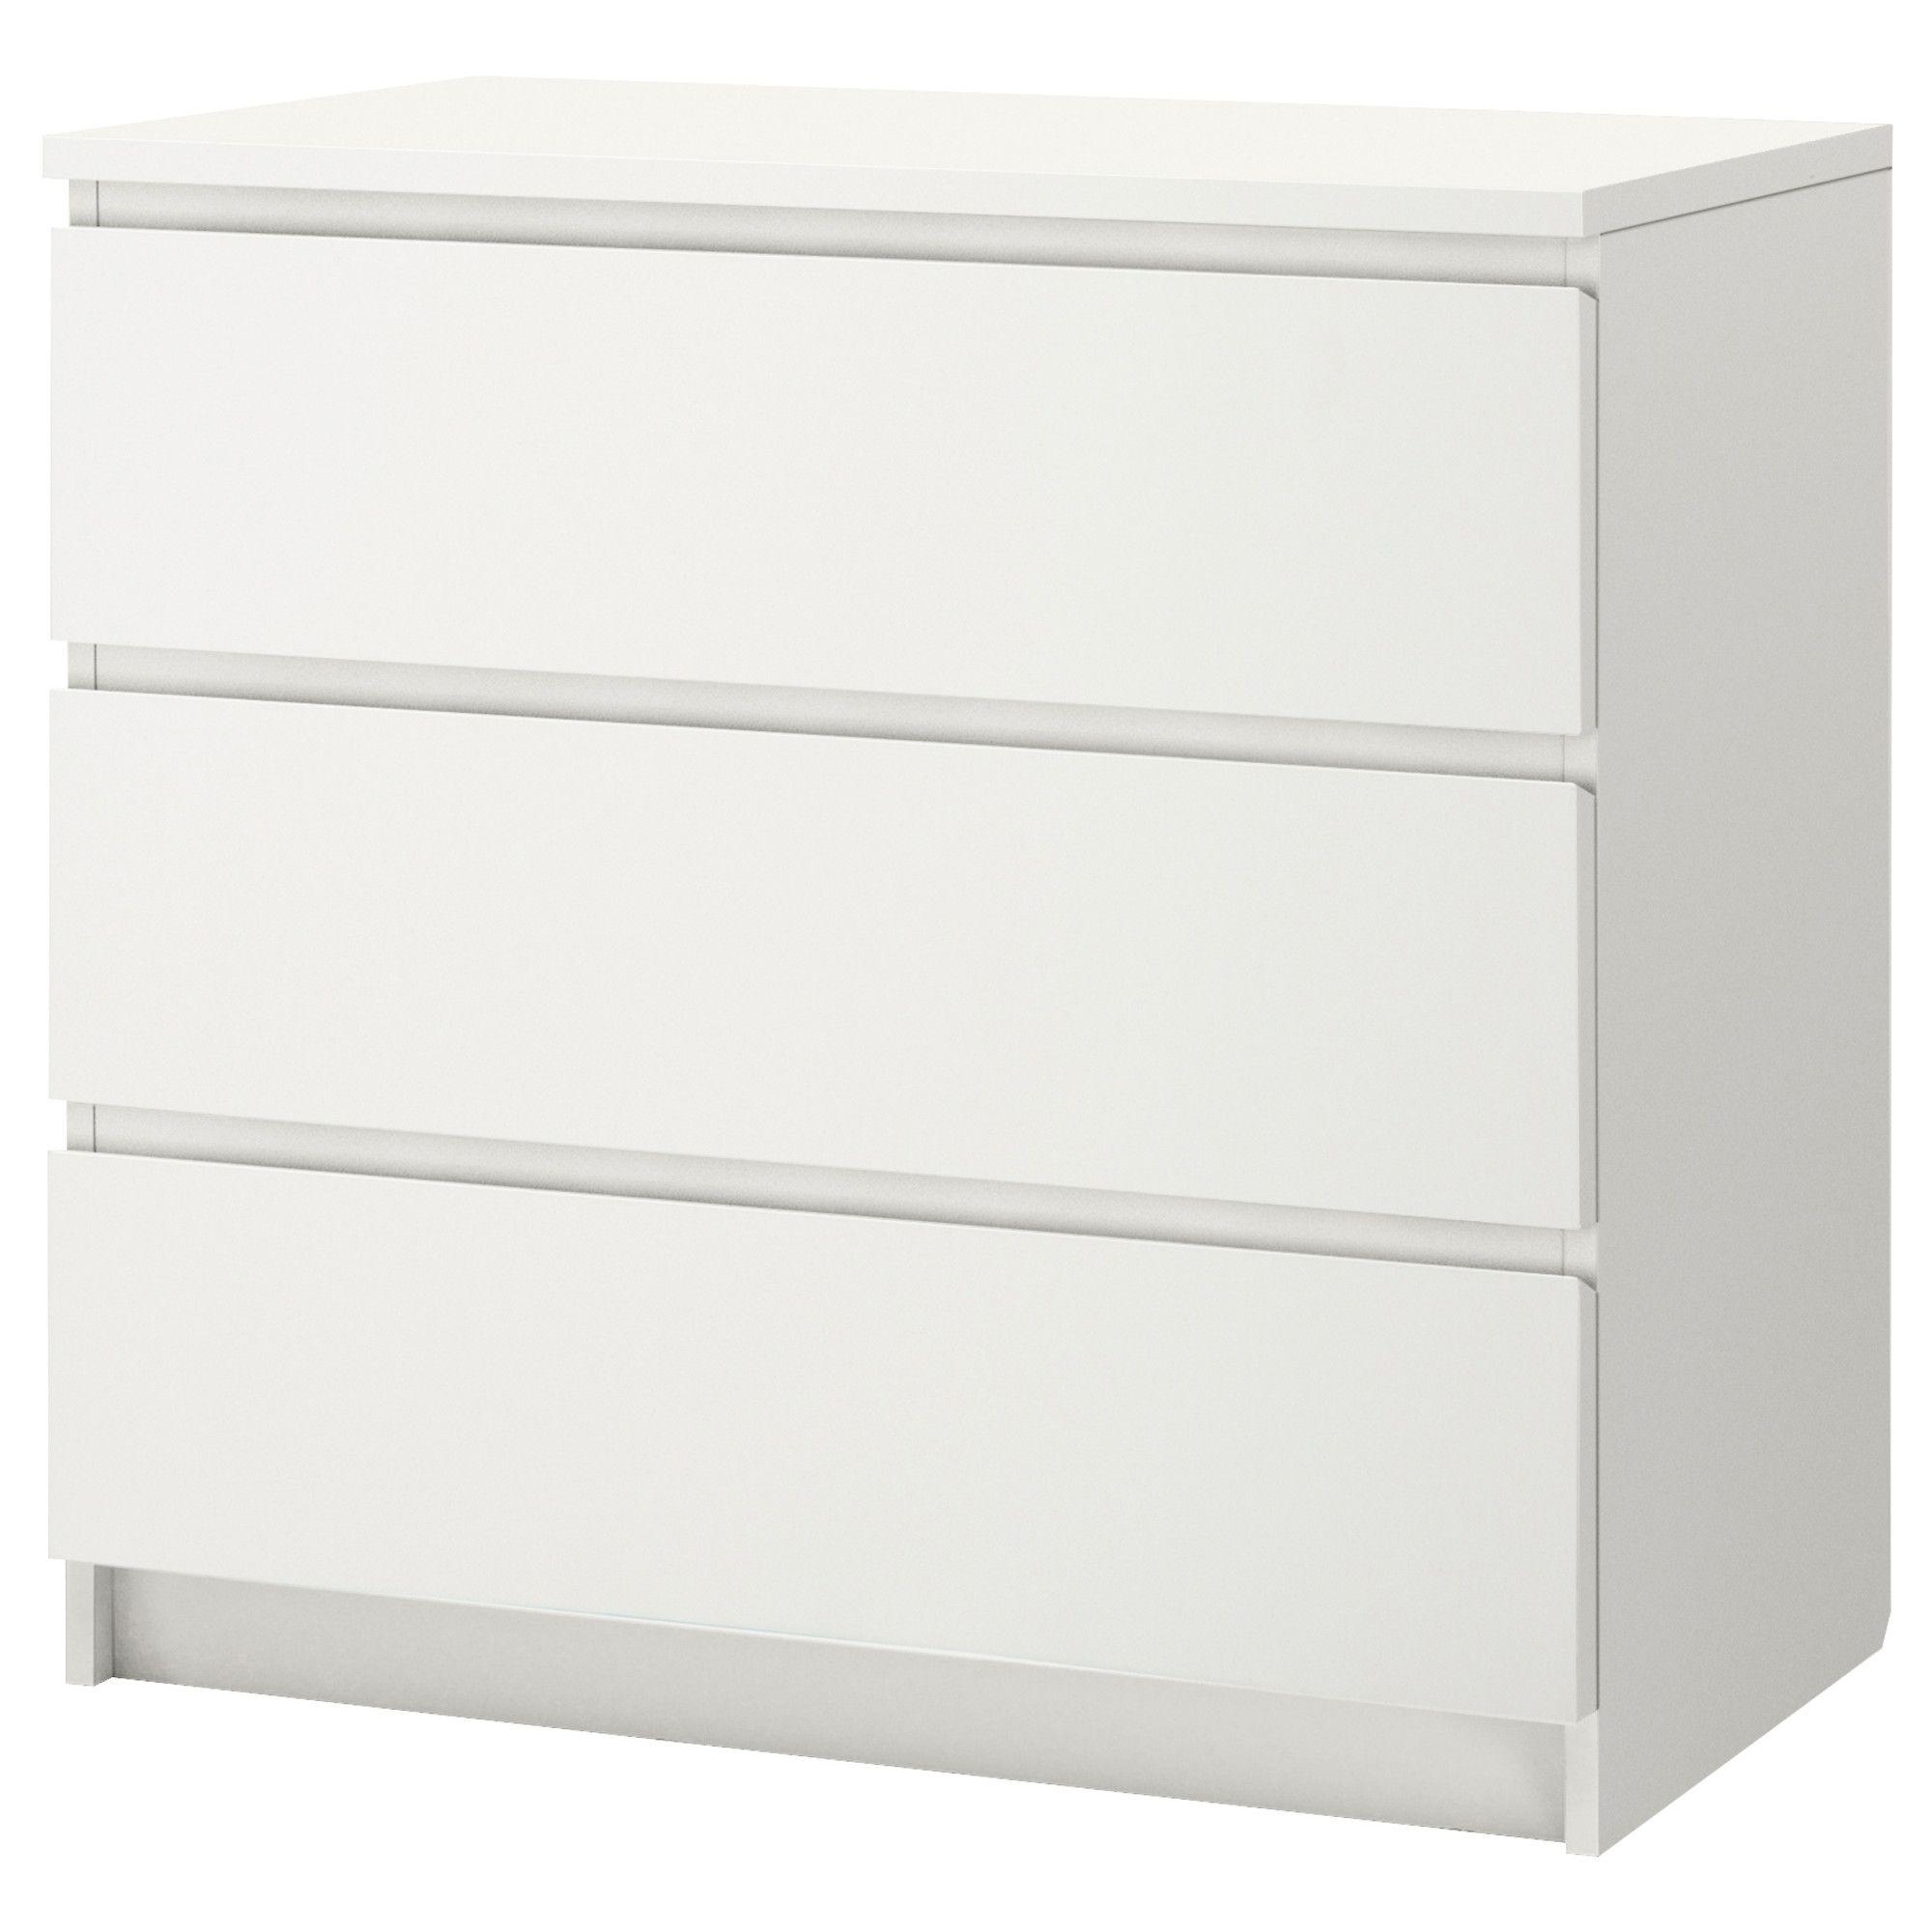 Ikea Us Furniture And Home Furnishings Ikea Malm White Chests